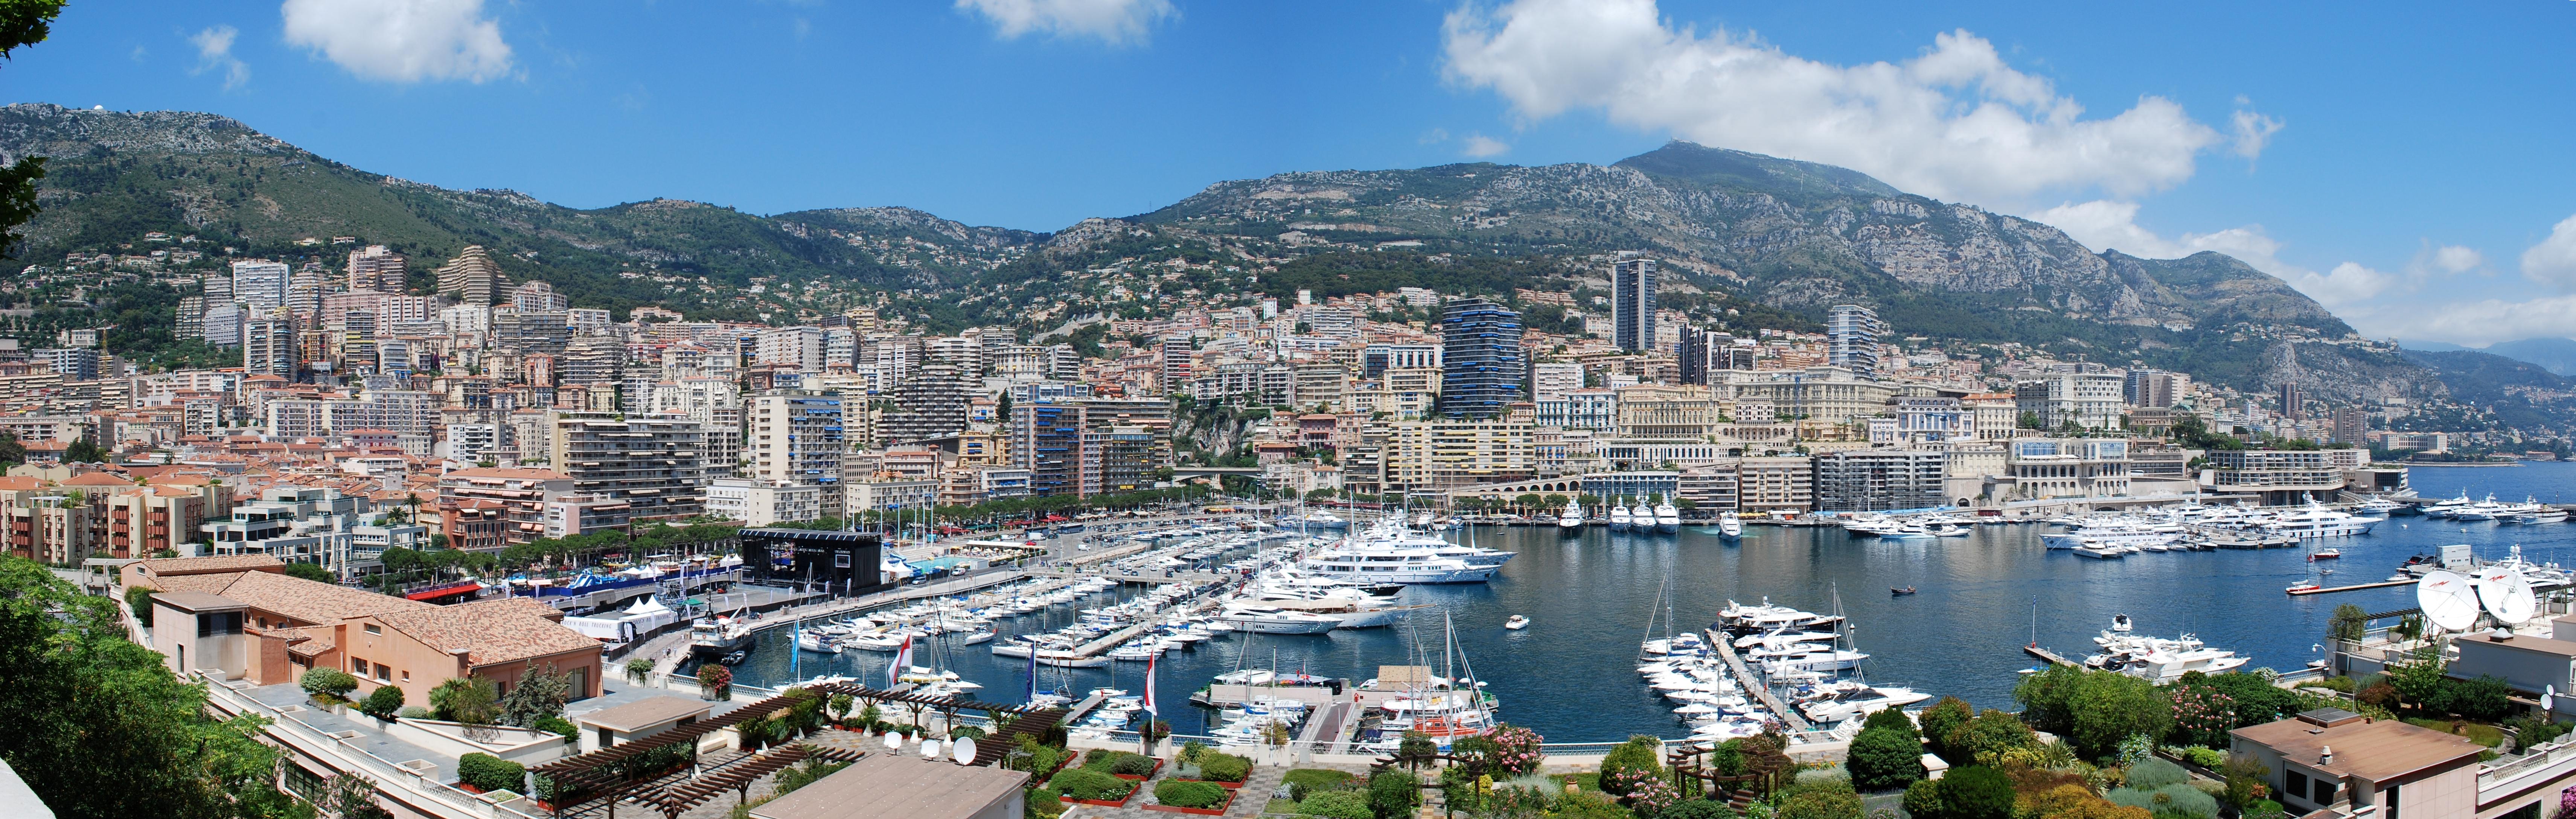 Monaco_City_001.jpg